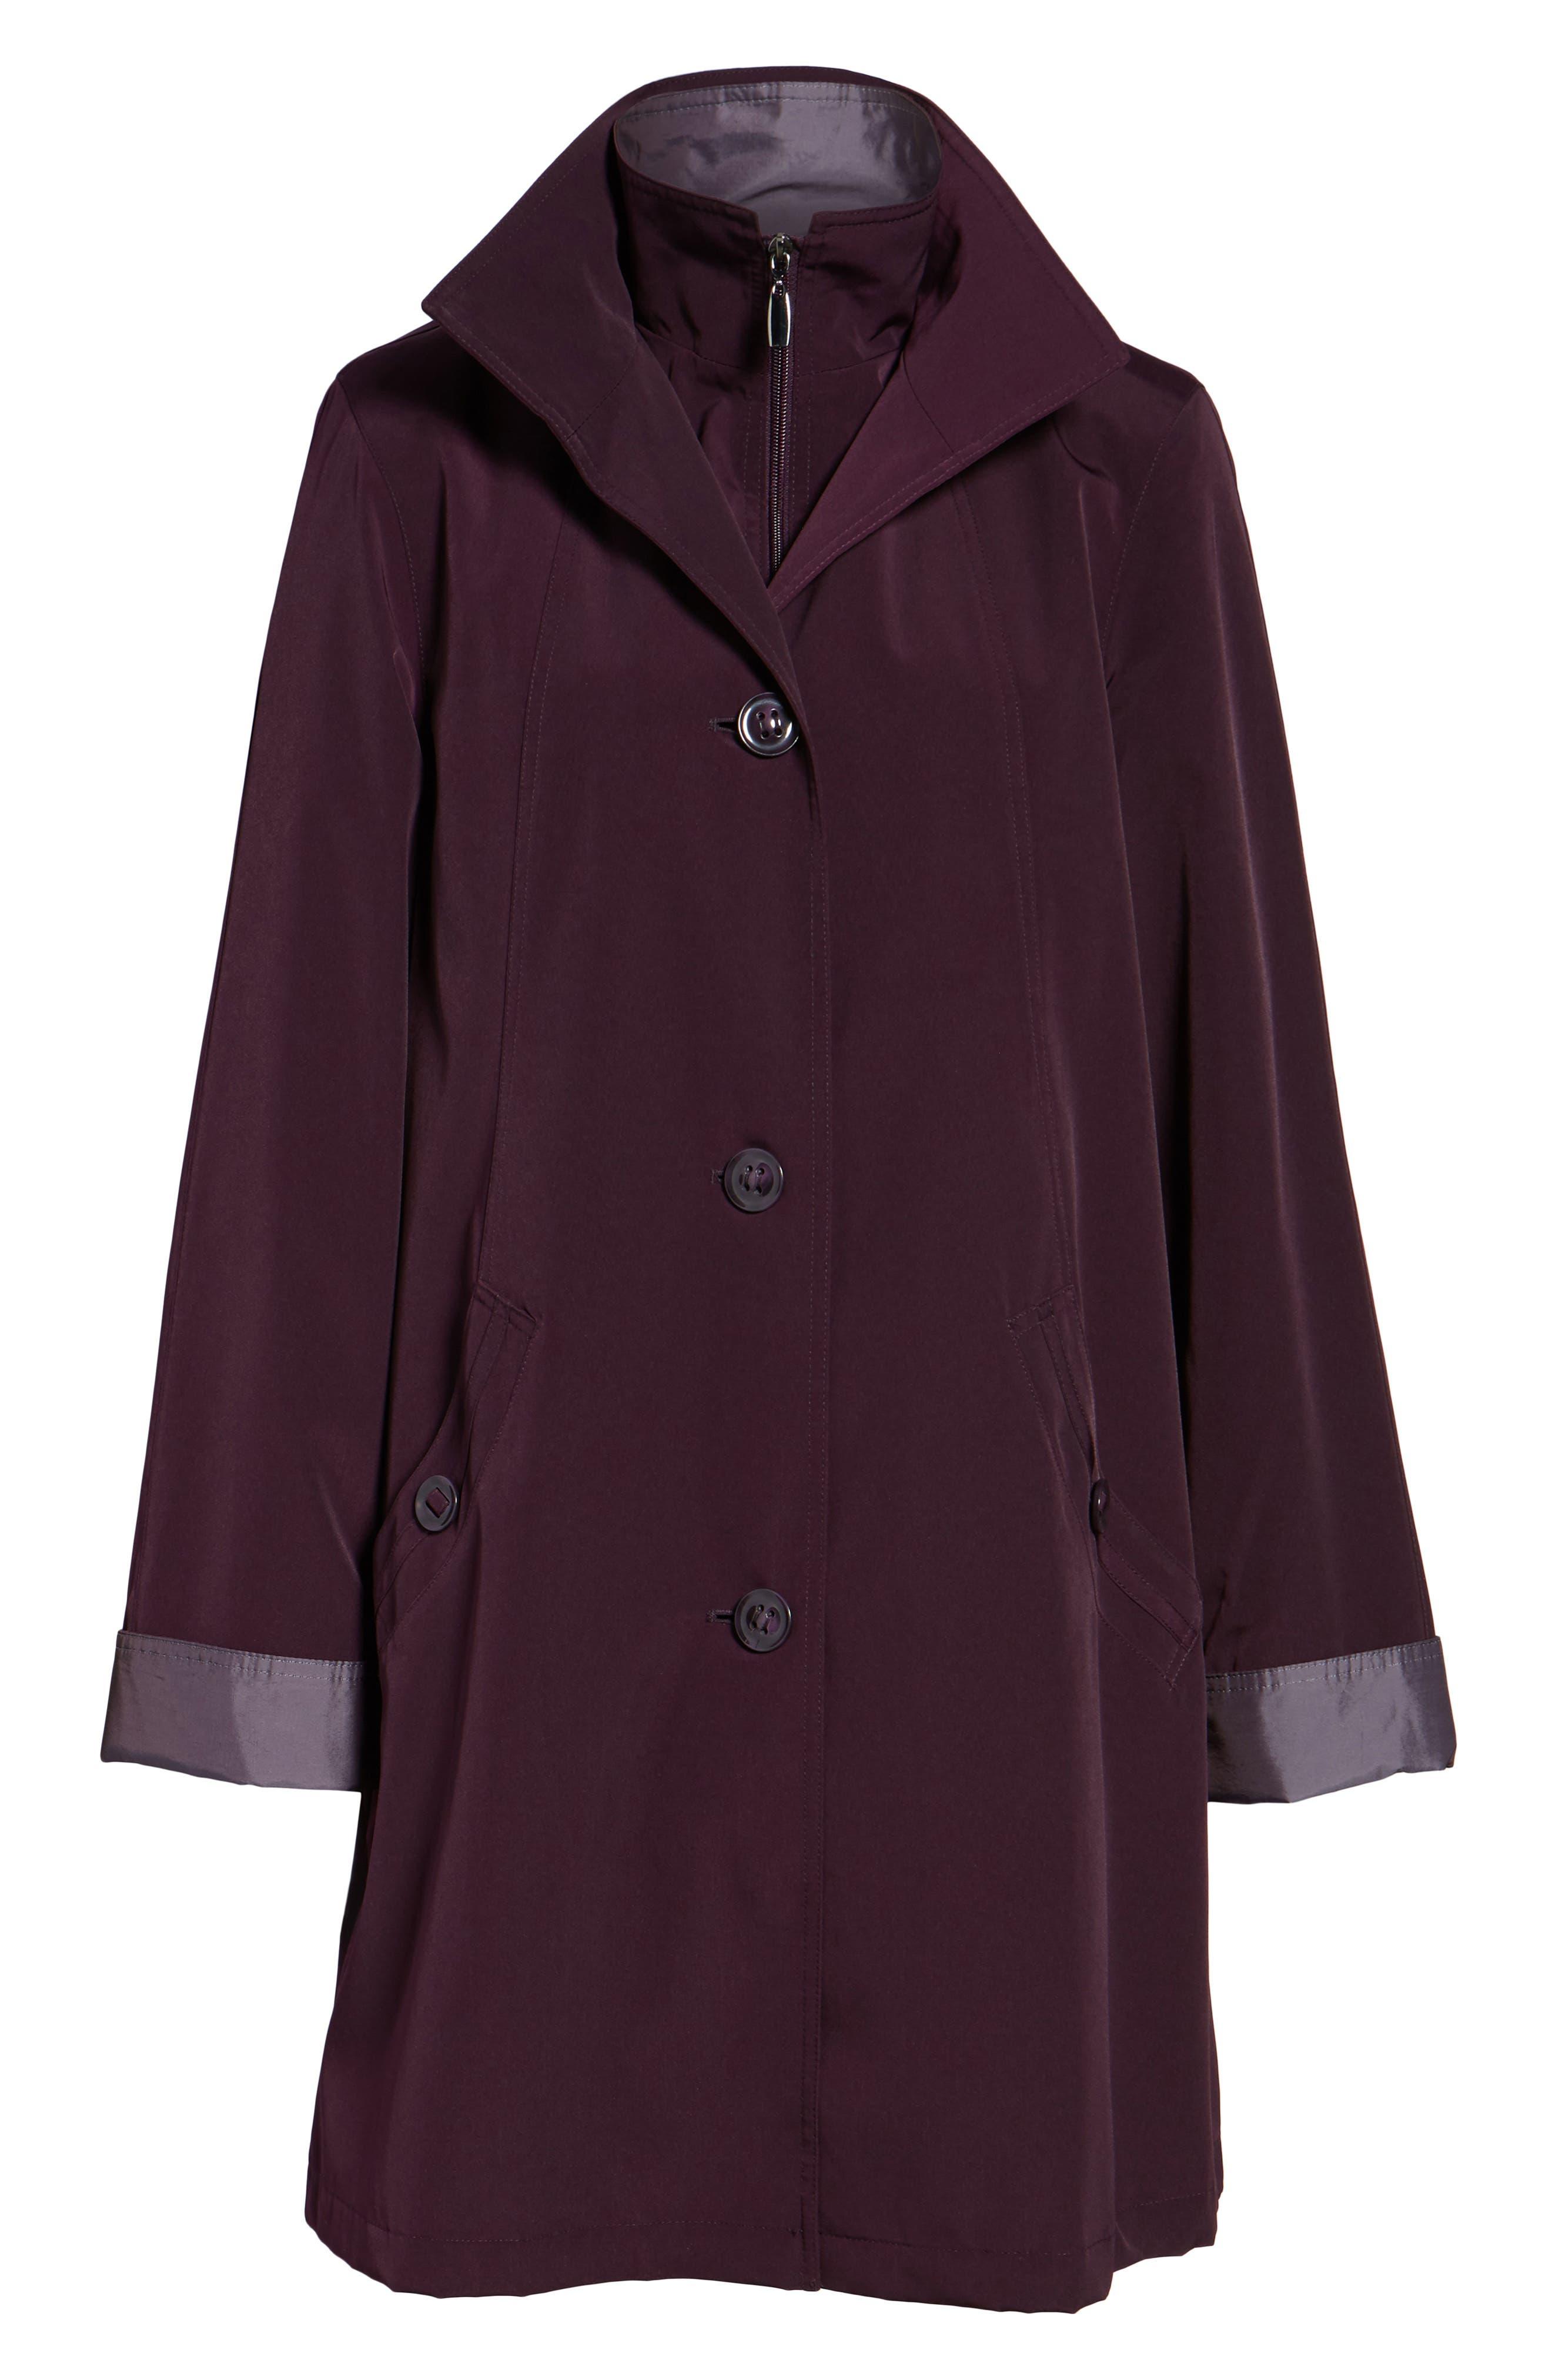 A-Line Raincoat with Detachable Hood & Liner,                             Main thumbnail 1, color,                             Blackberry